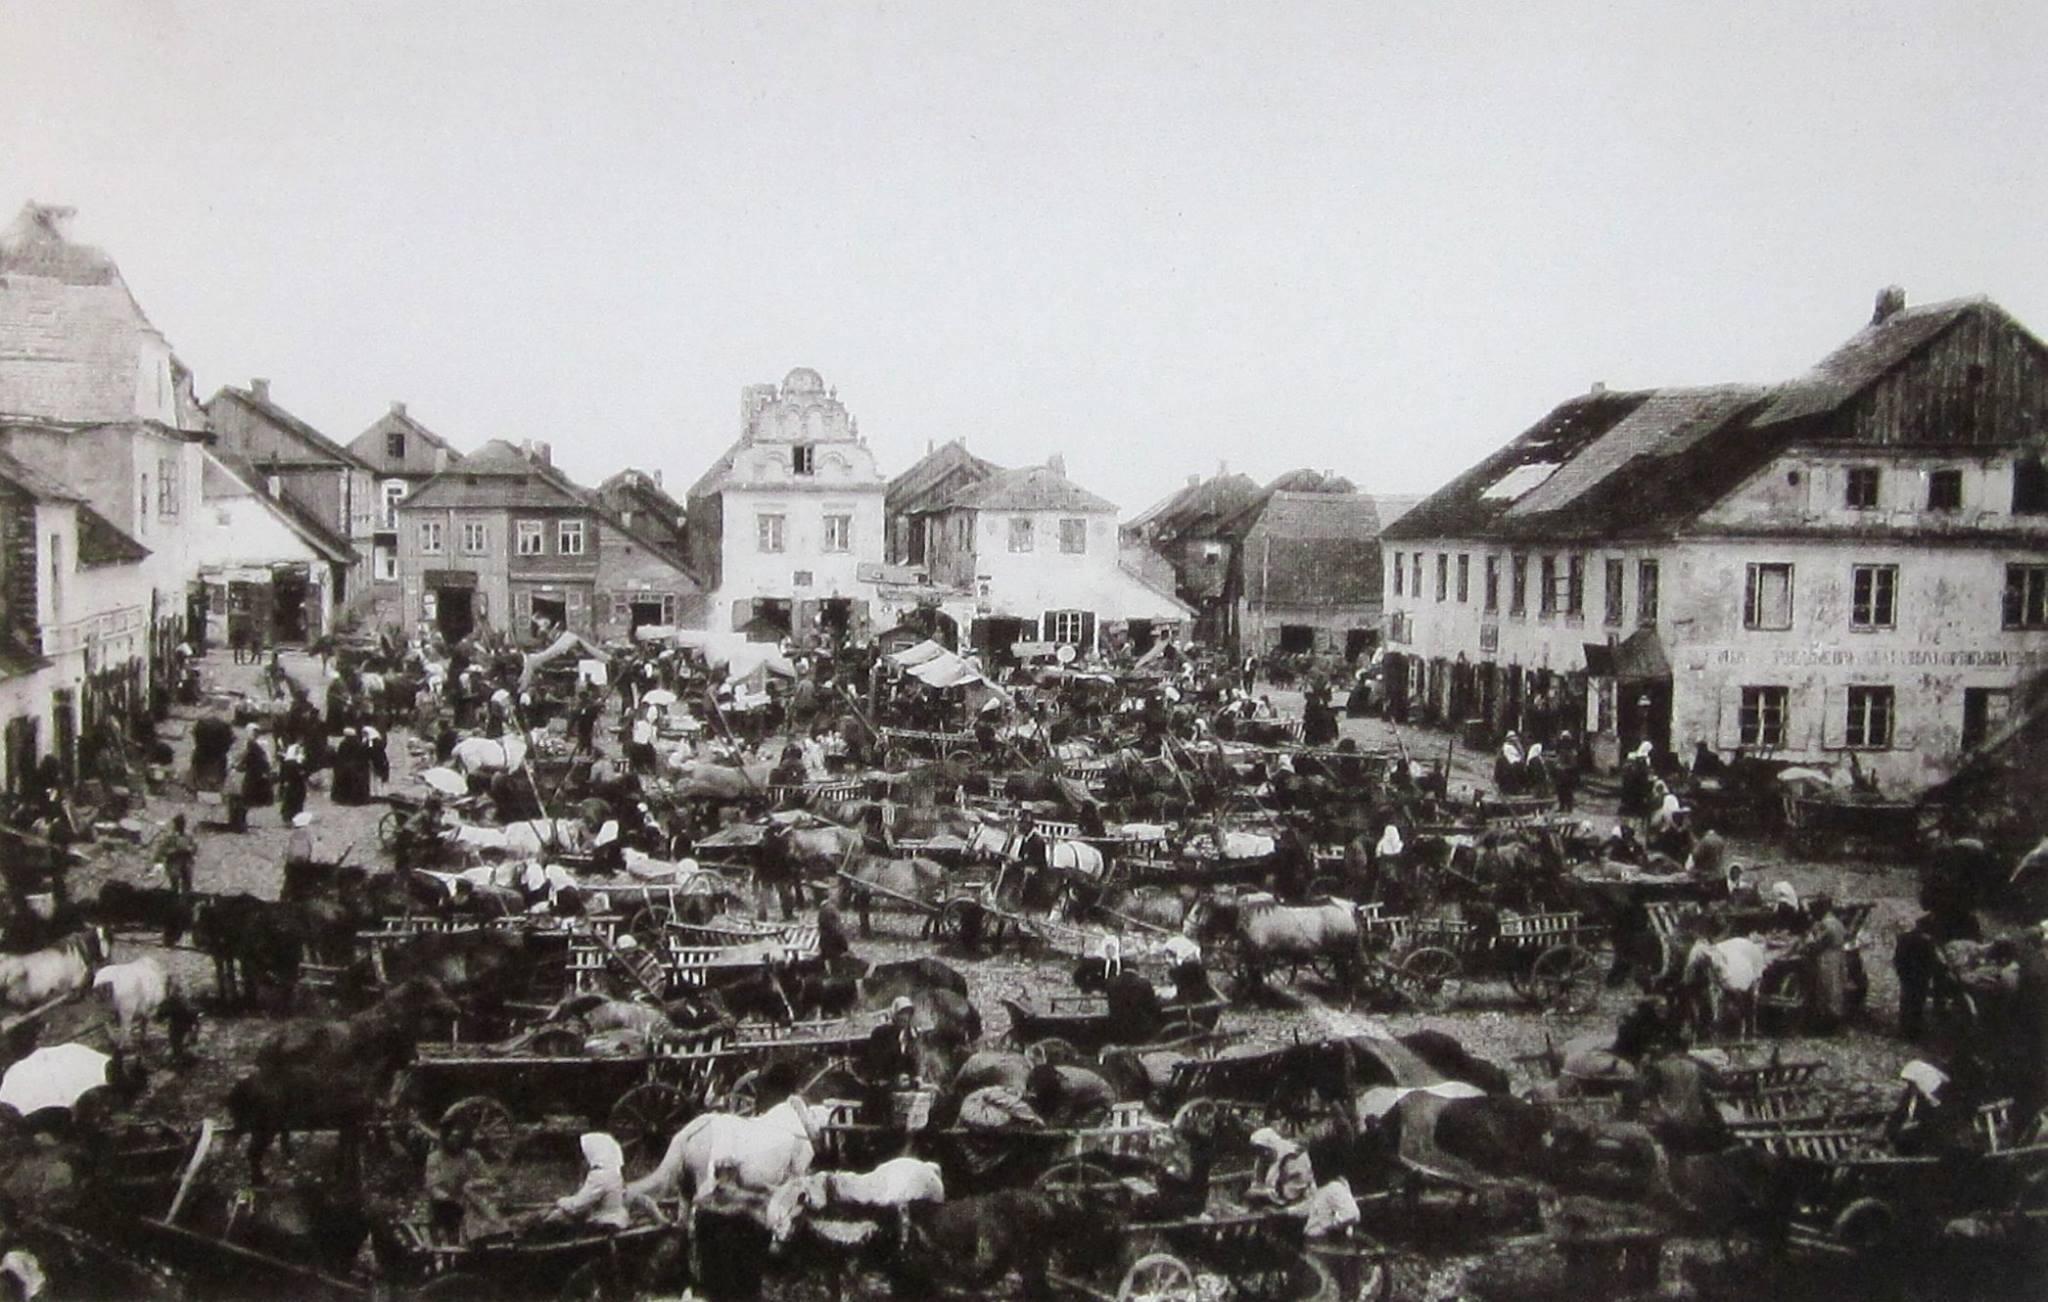 Keidan market square, 1910s